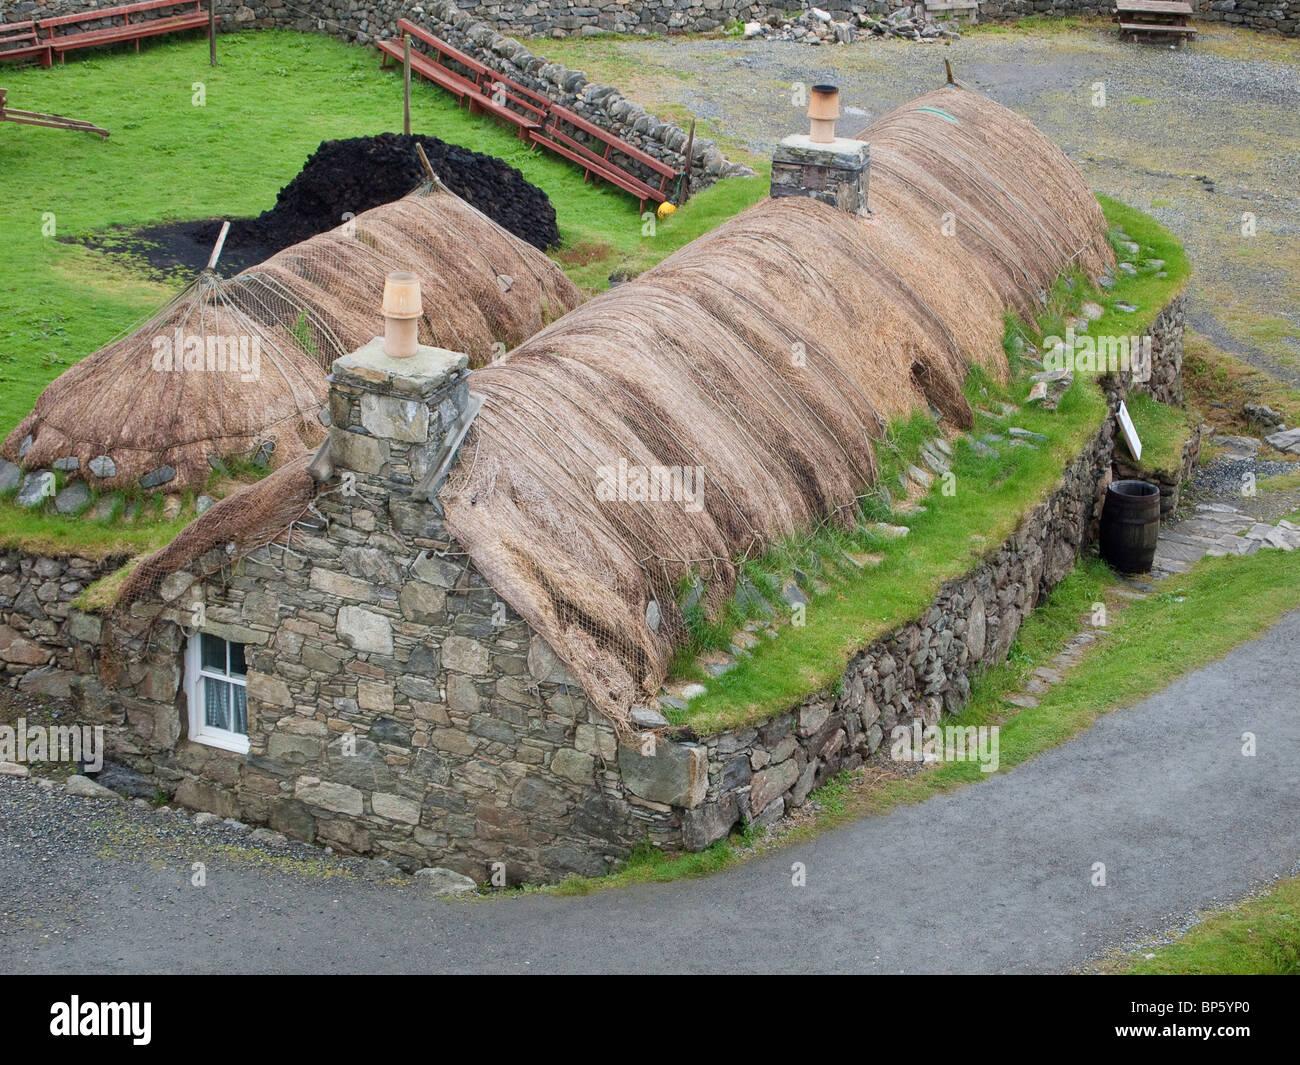 Black House at Gearrannan, Isle of Lewis, Scotland - Stock Image